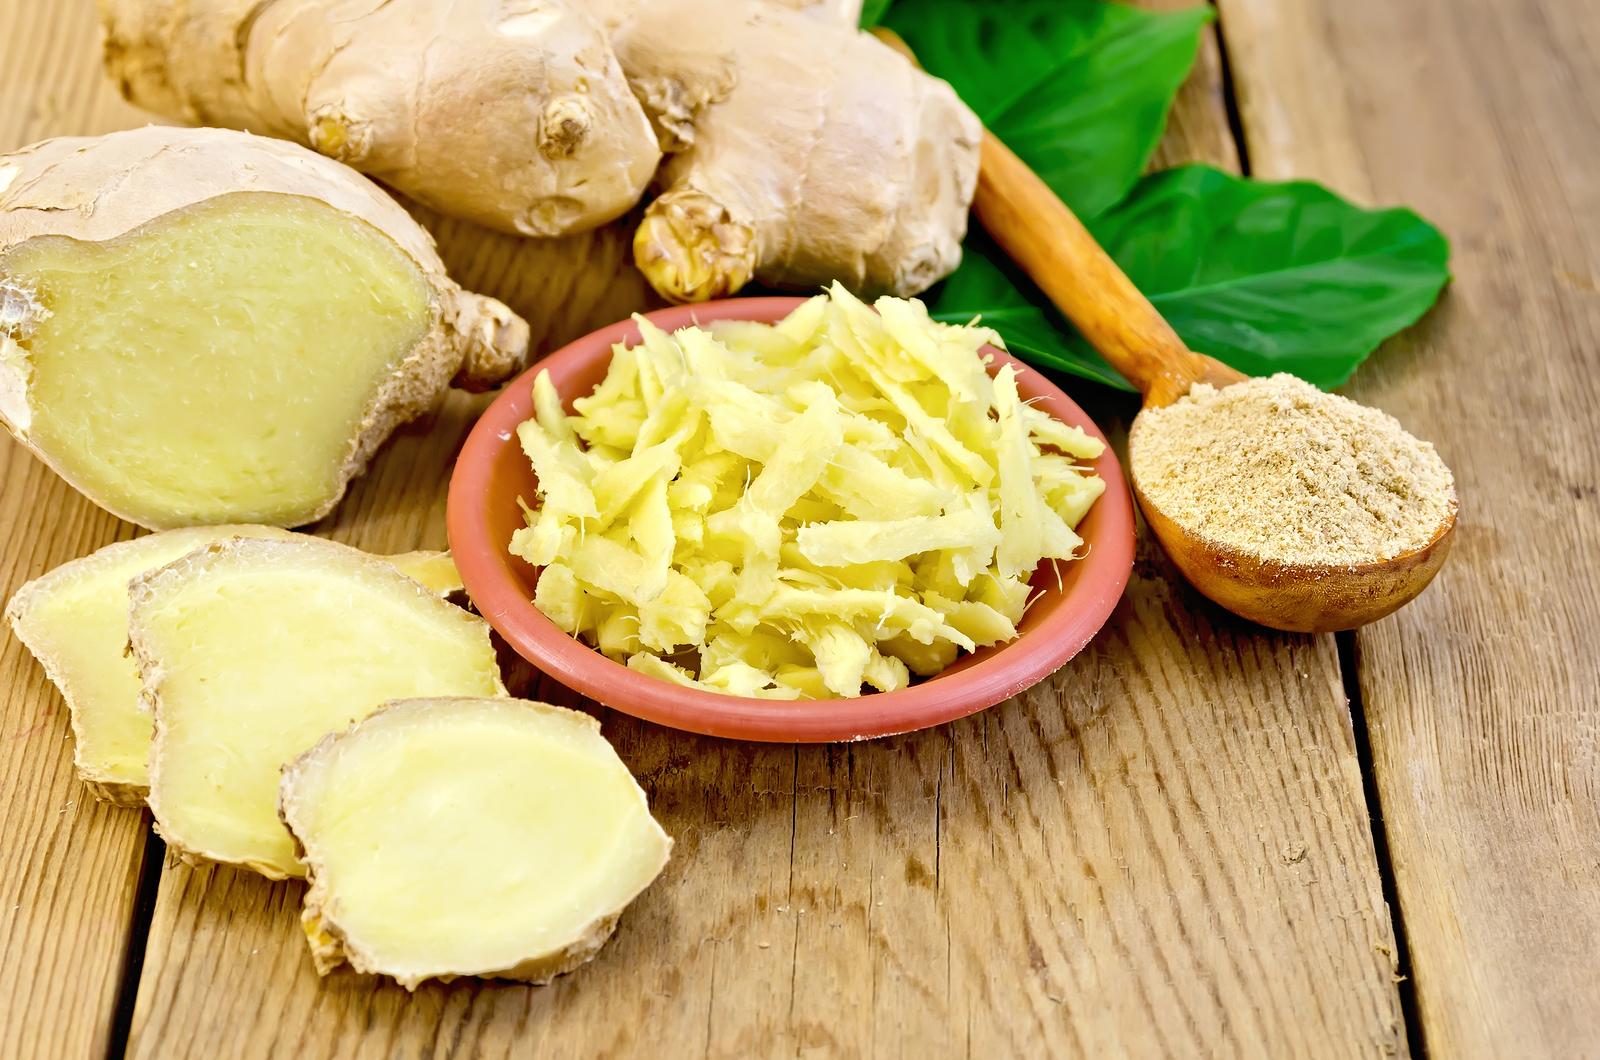 Cara Mengecilkan Perut dengan Lemon dan Air Jahe